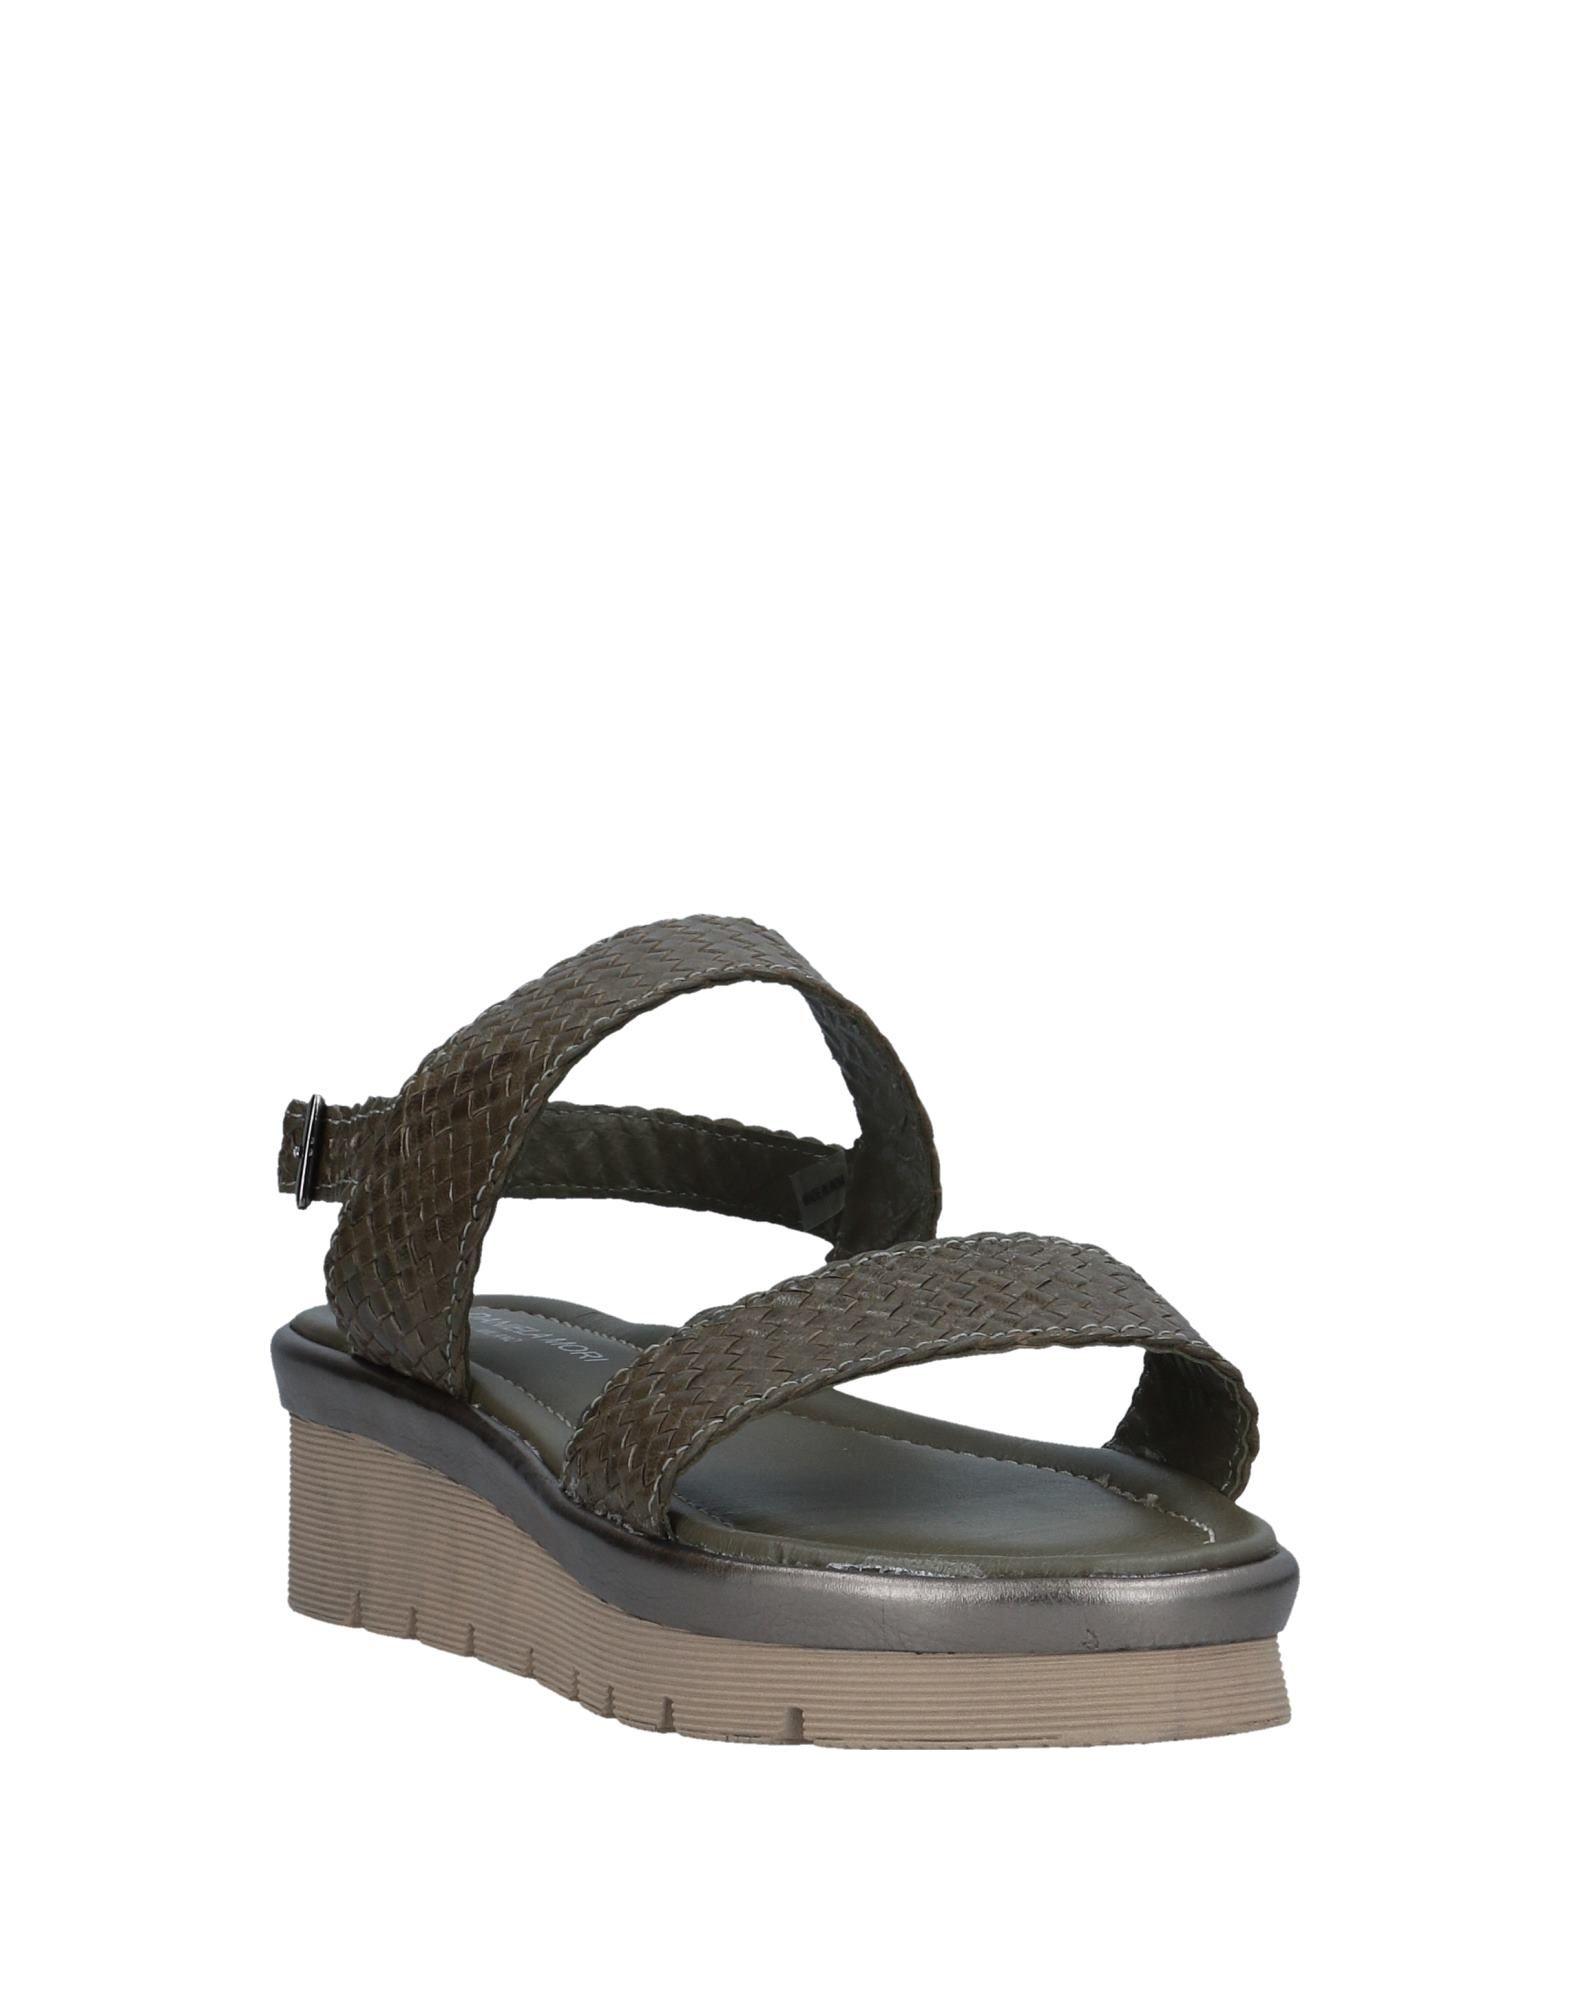 Daniela Mori Milano Gute Sandalen Damen  11523142RT Gute Milano Qualität beliebte Schuhe 817a8c